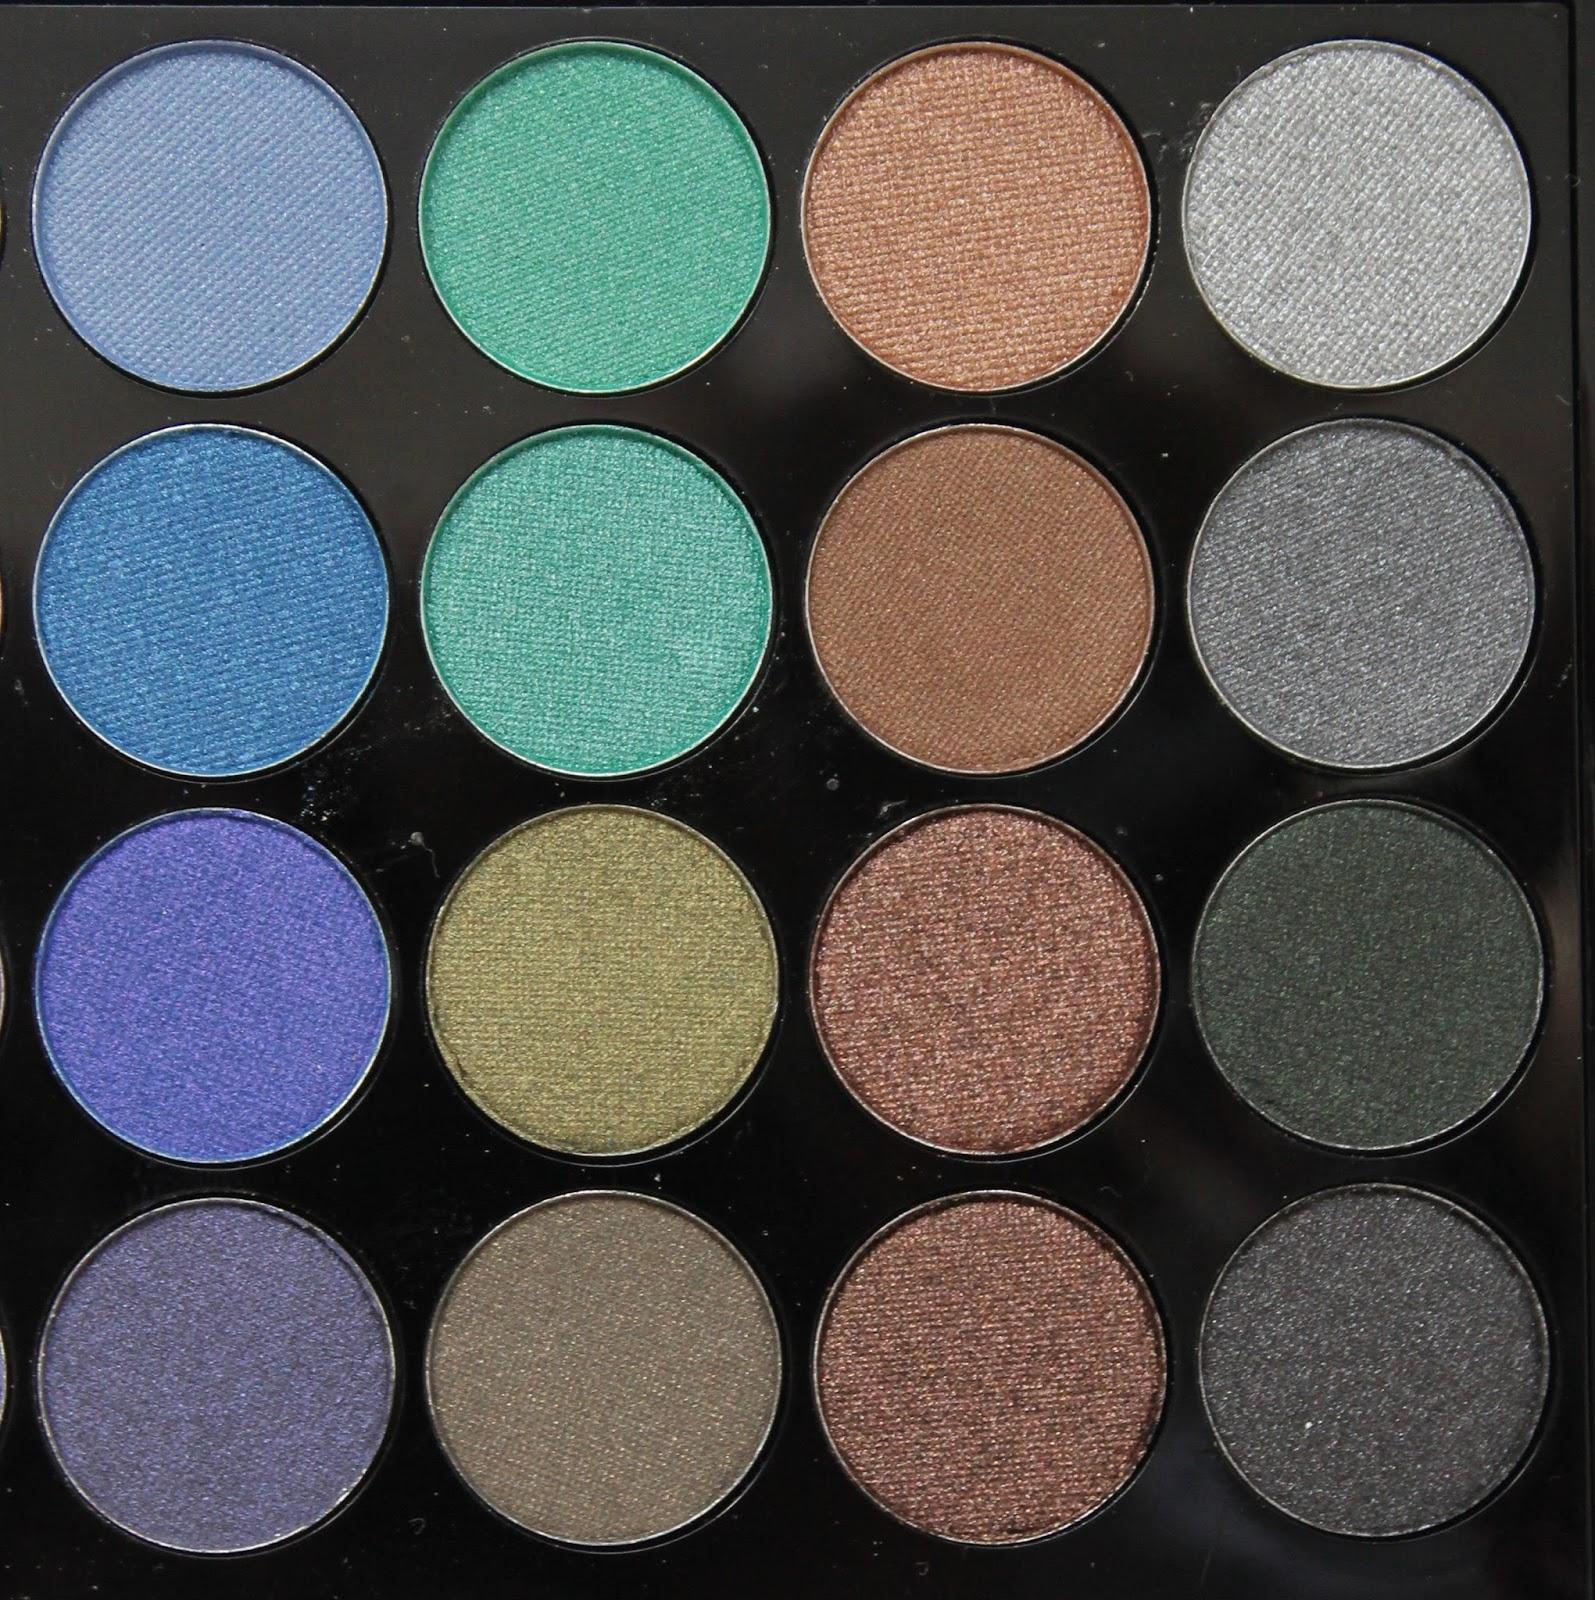 Coconikmakeup mermaids forever makeup revolution - Colores verdes azulados ...